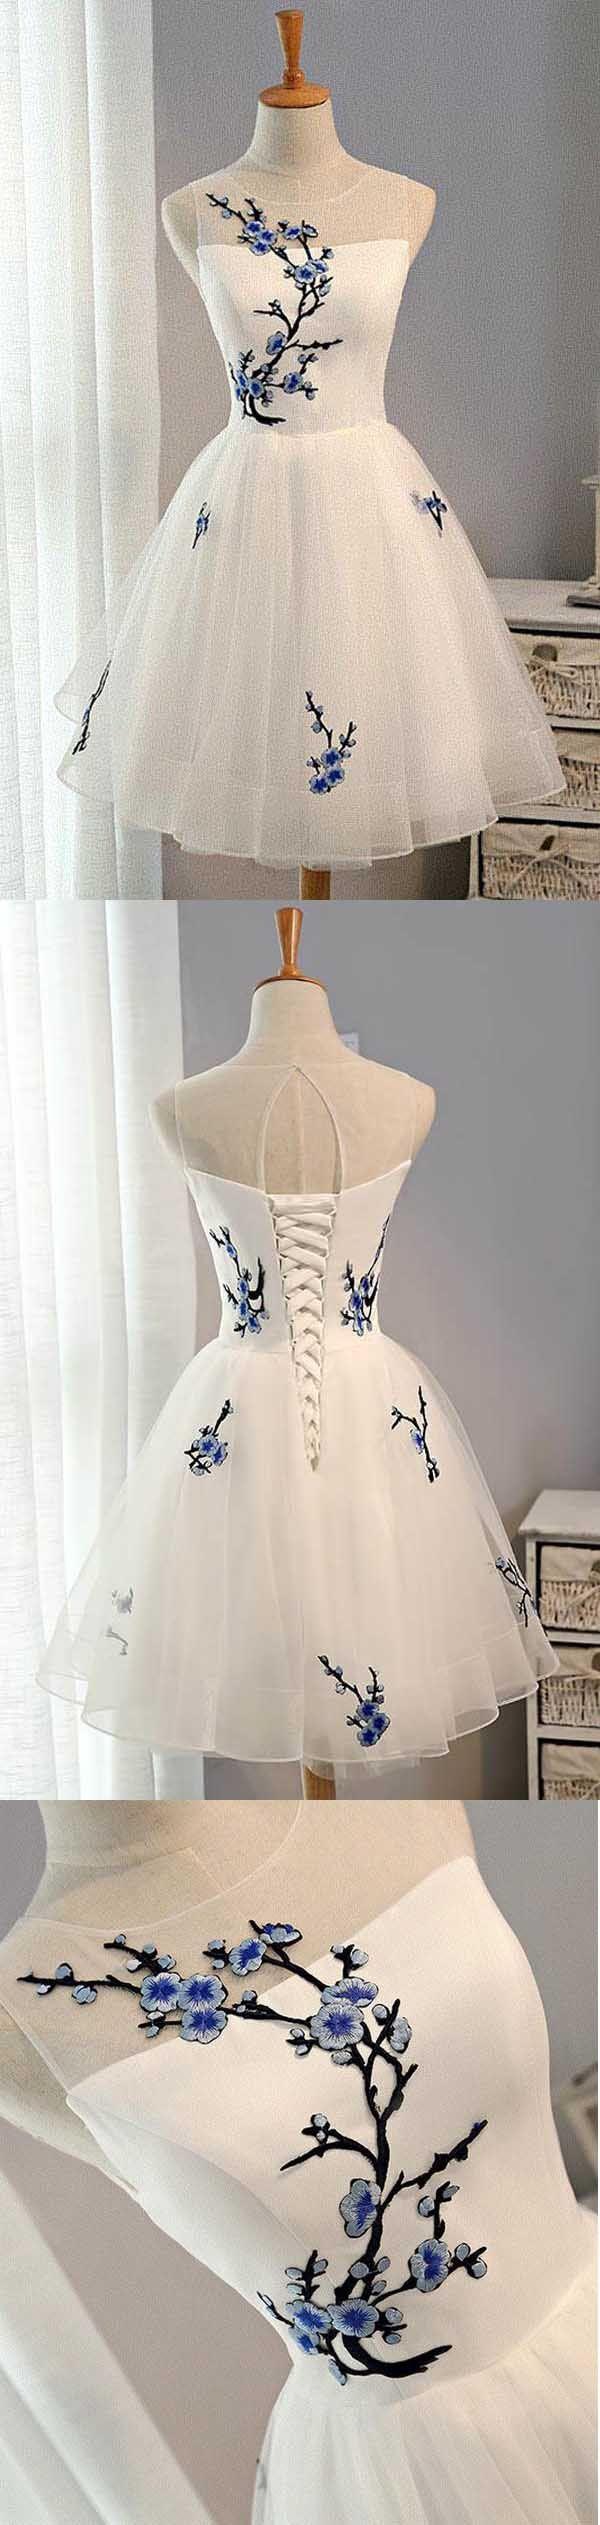 White aline tulle short prom dress white homecoming dress pd